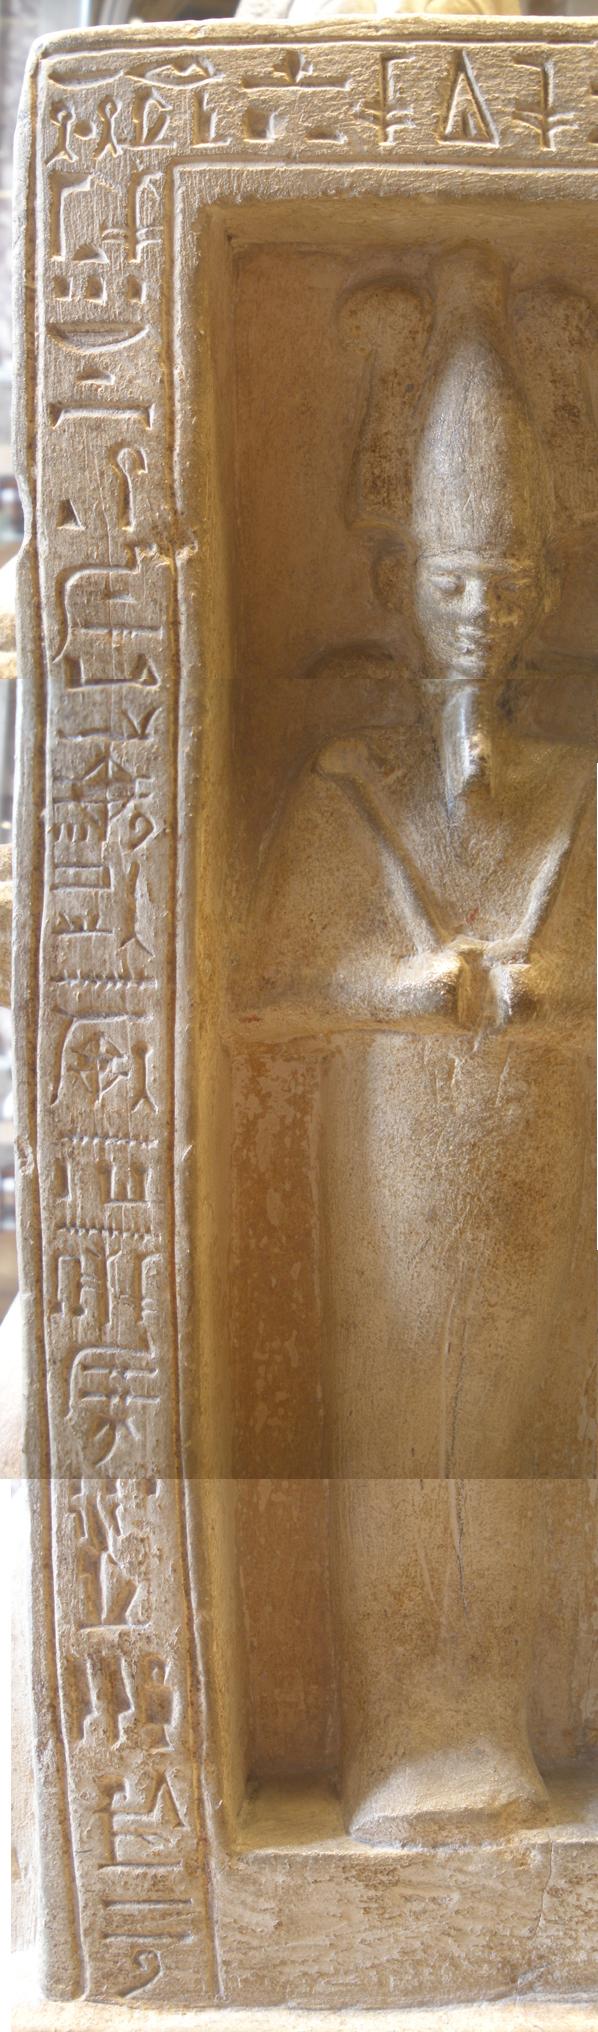 Souty hieroglyphes